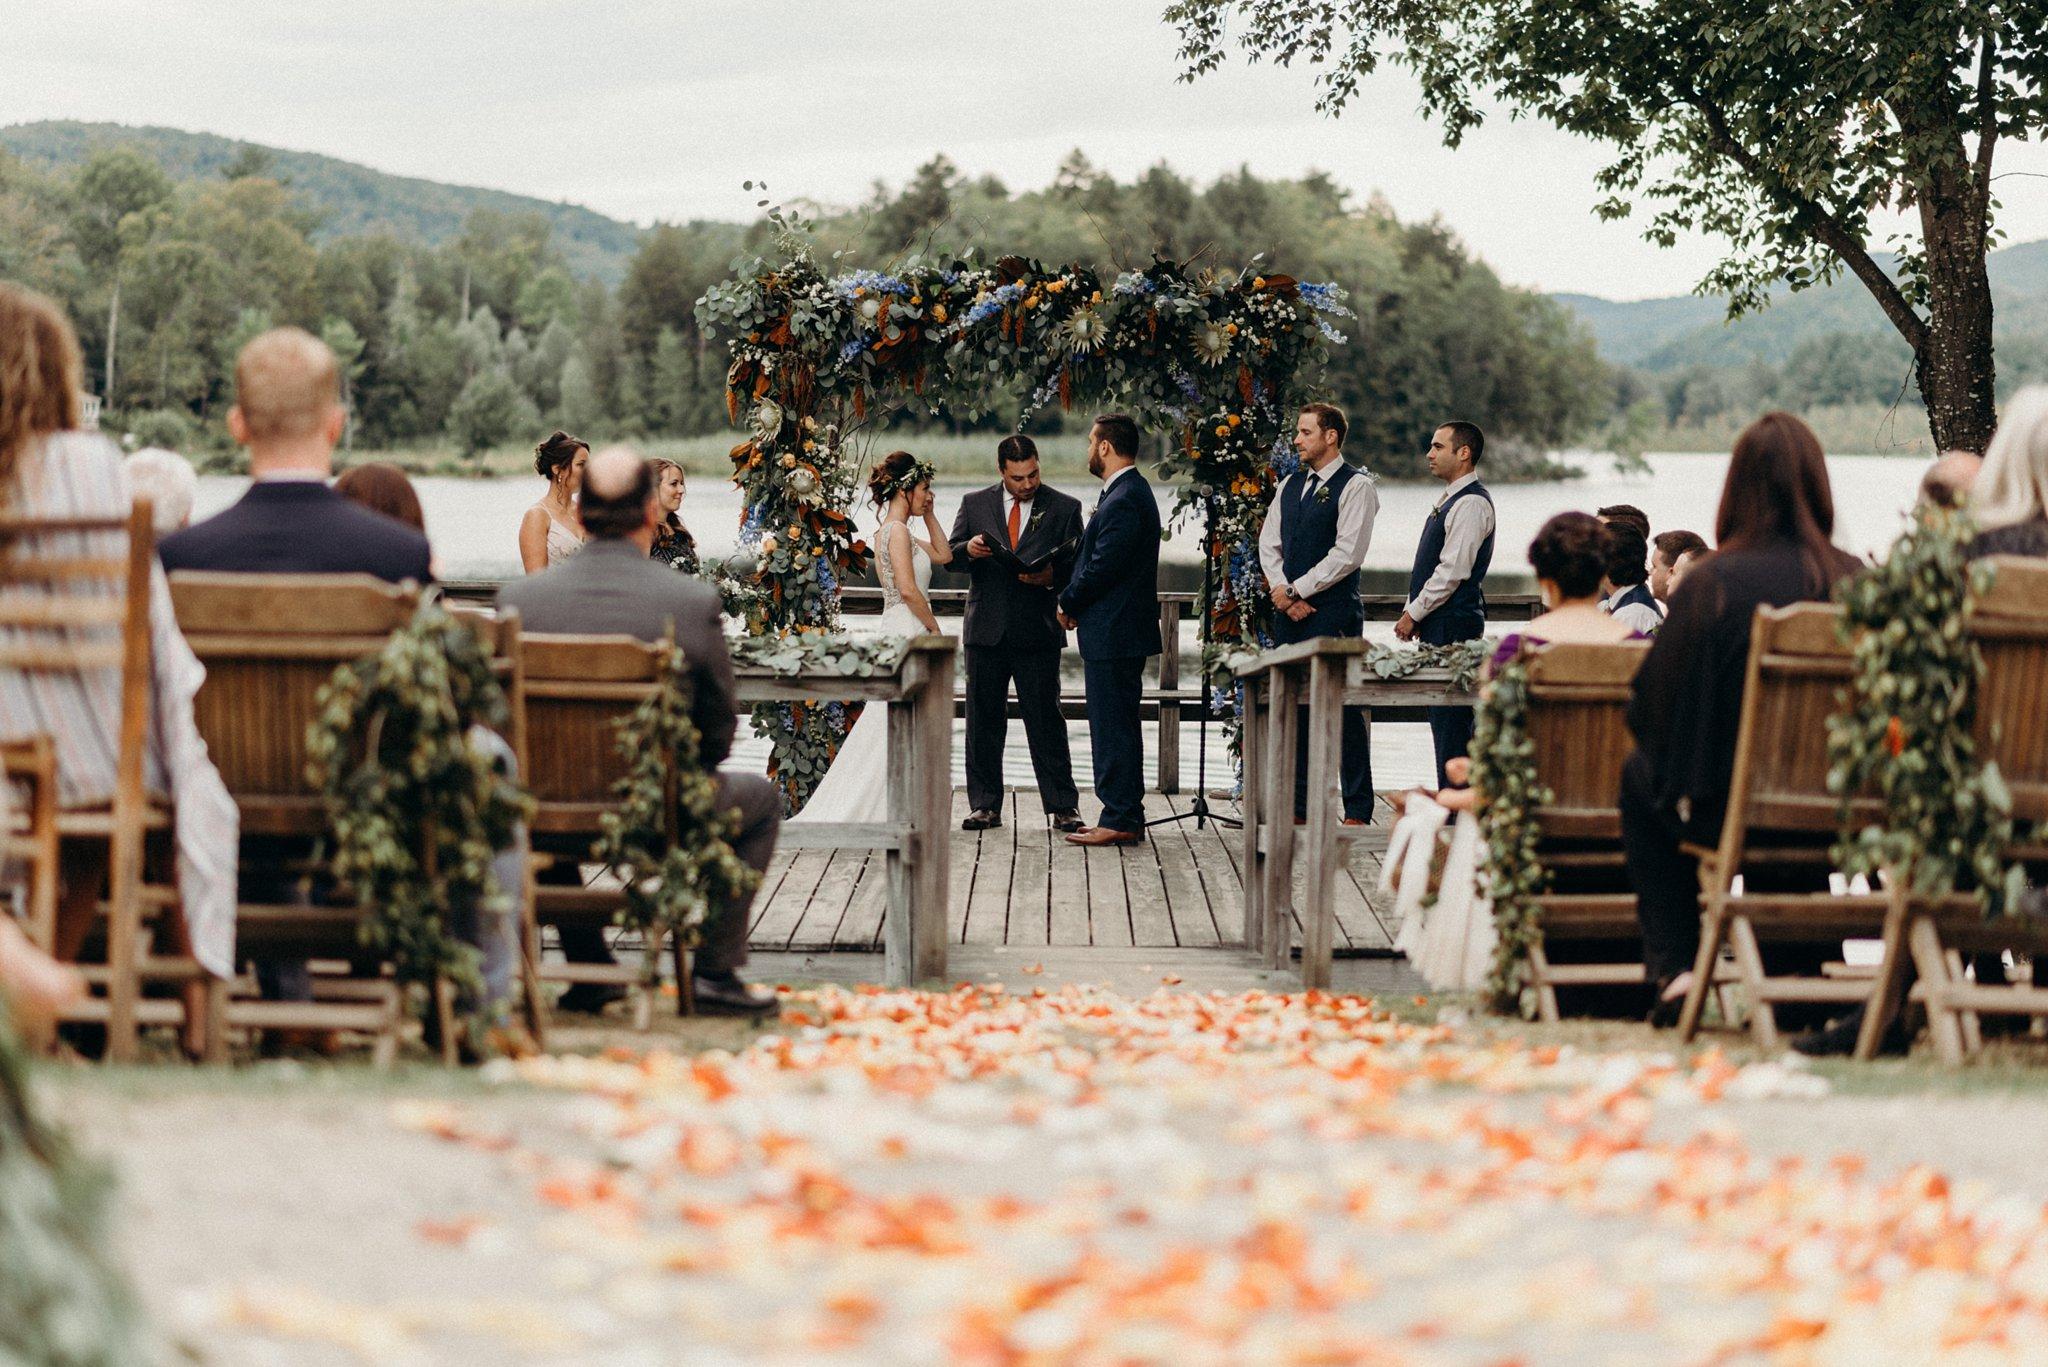 kaihla_tonai_intimate_wedding_elopement_photographer_6631.jpg